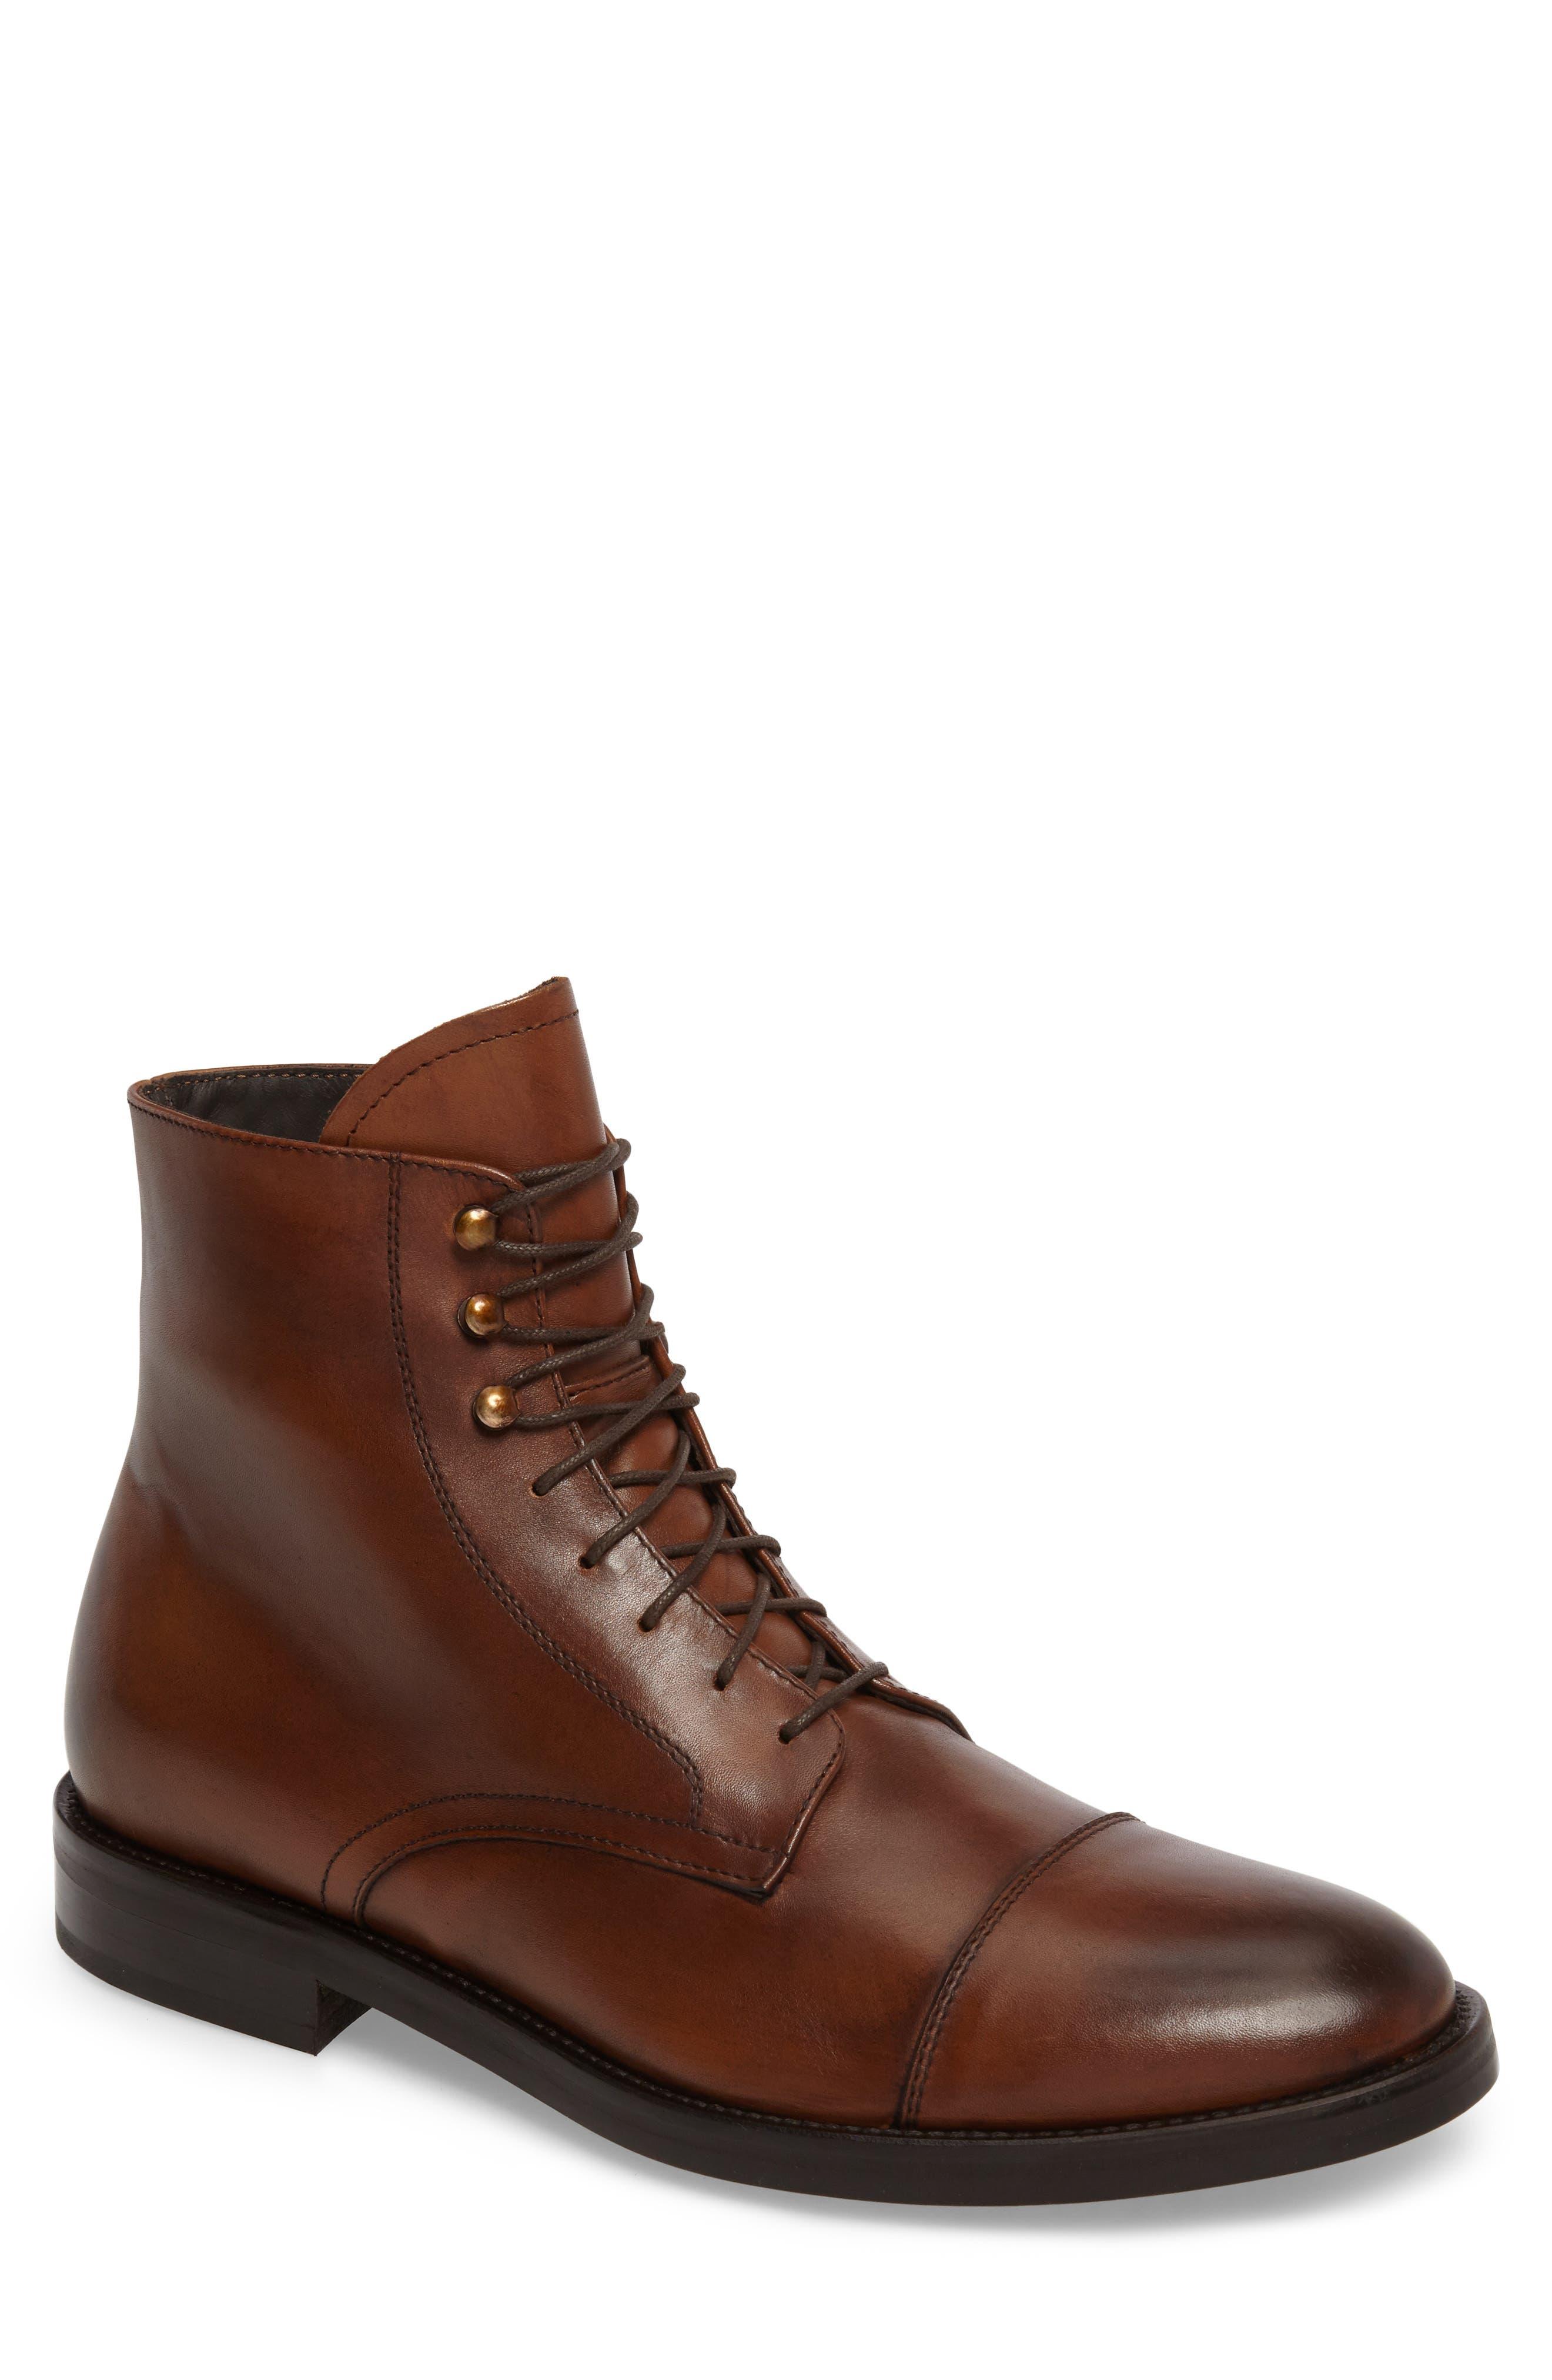 Henri Cap Toe Boot,                         Main,                         color, Cuoio Leather